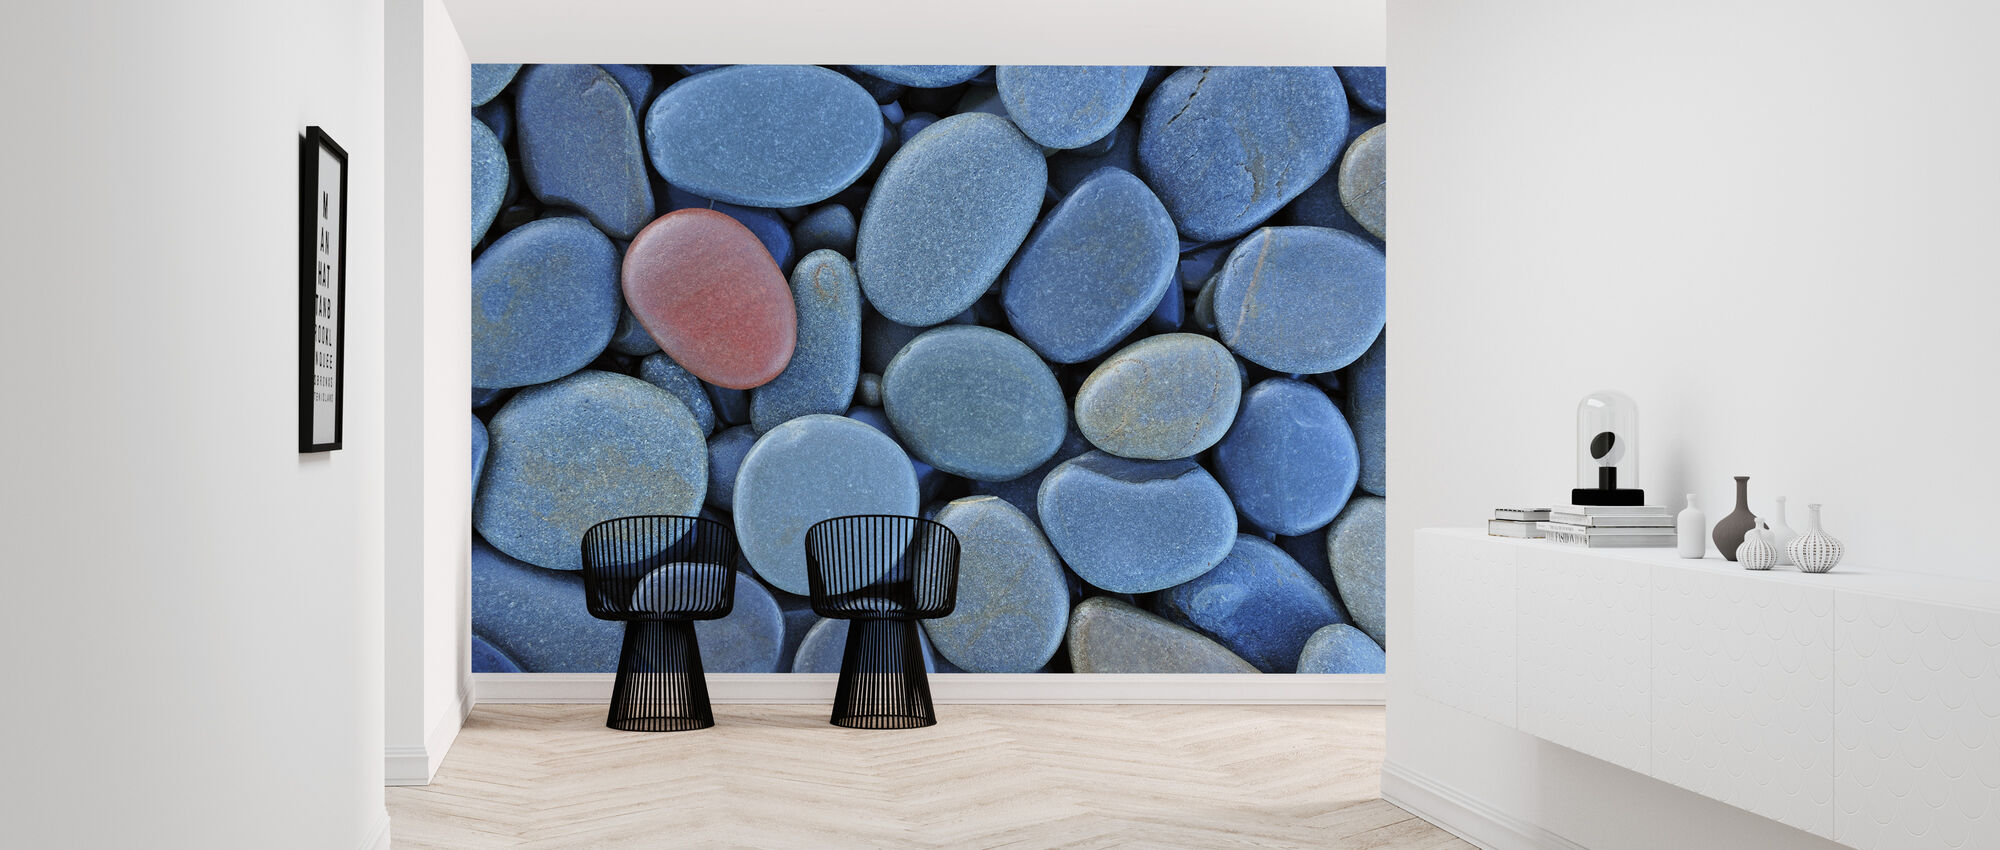 Smooth Blue Stones - Wallpaper - Hallway